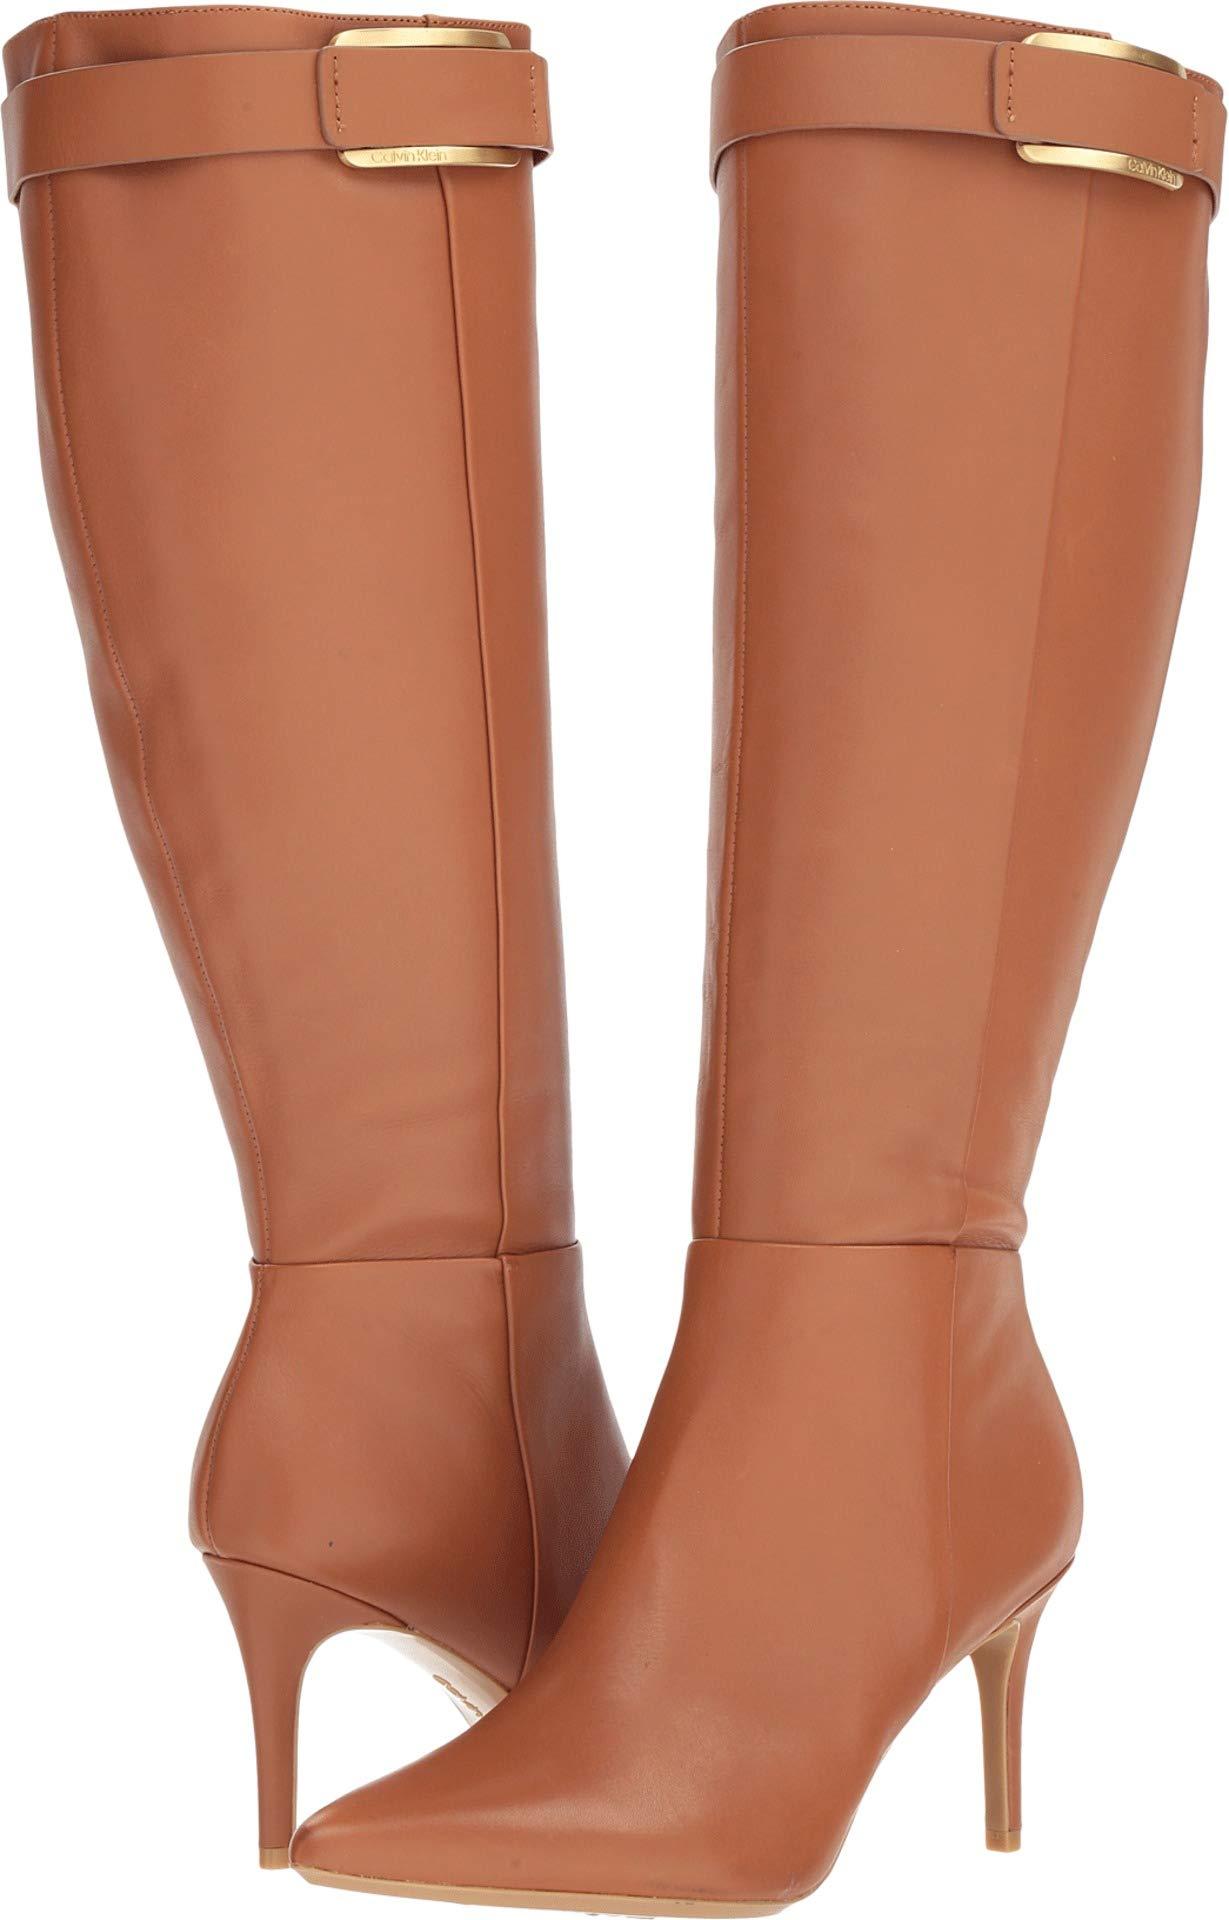 Calvin Klein Women's GLYDIA Knee High Boot, Cognac Leather Wide Calf, 5 M US by Calvin Klein